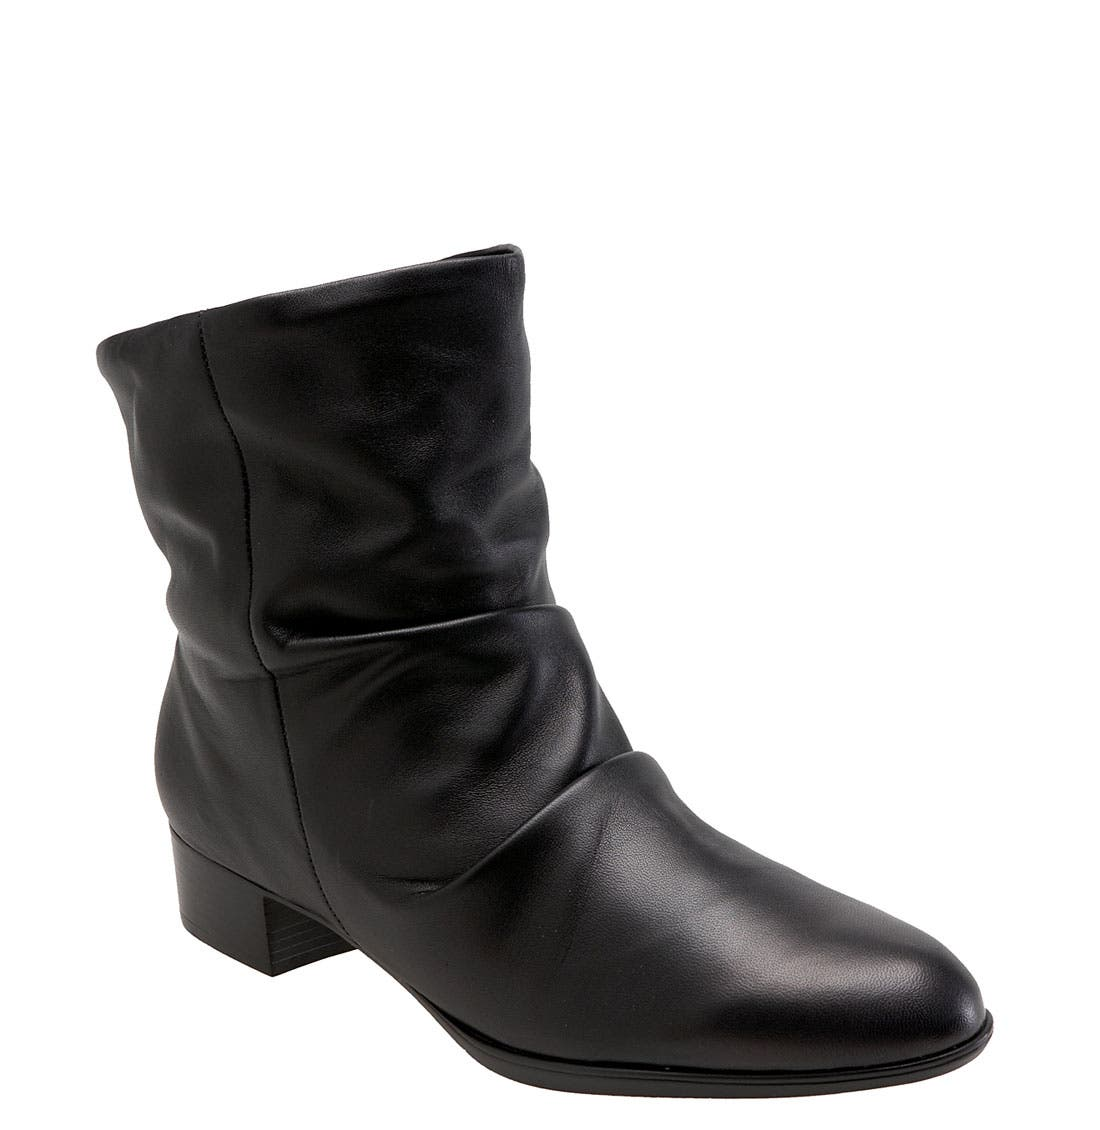 Alternate Image 1 Selected - Munro 'Tate' Boot